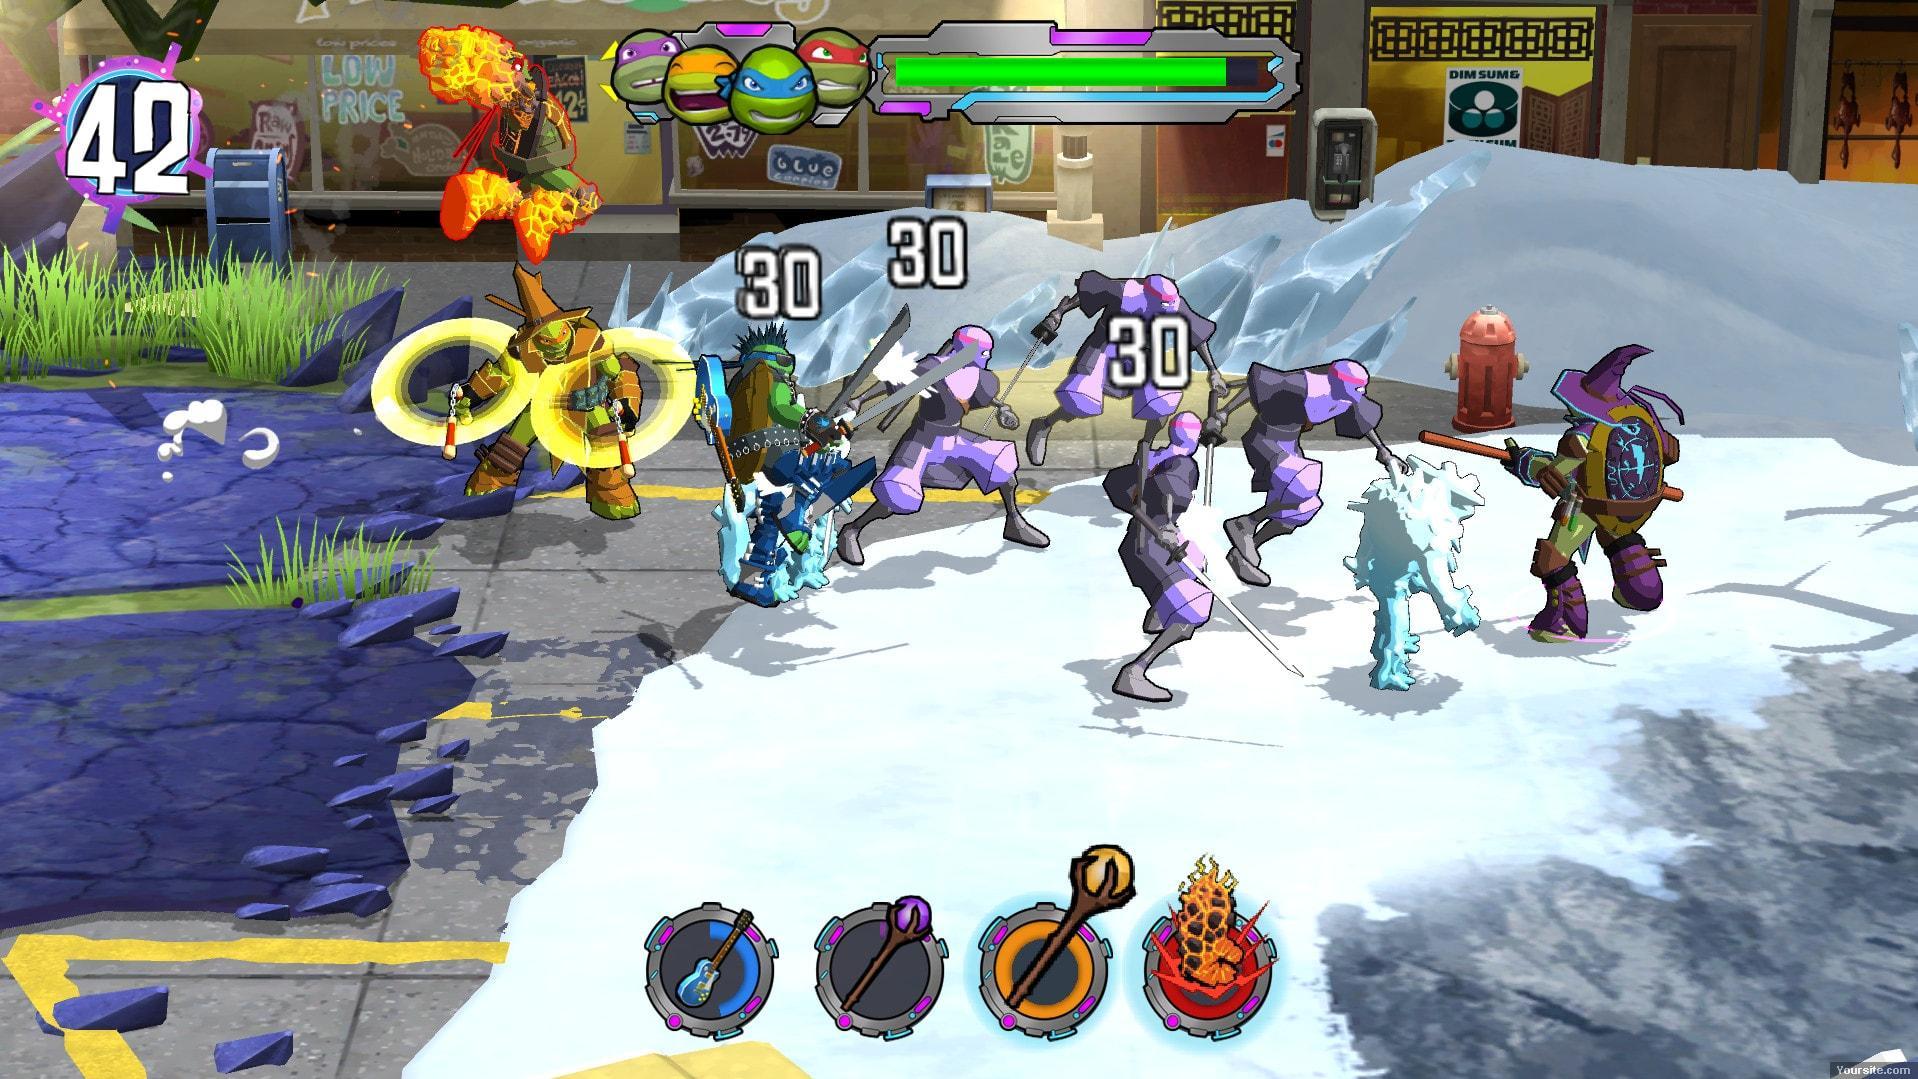 Скриншоты к Teenage Mutant Ninja Turtles: Portal Power v1.0 на русском